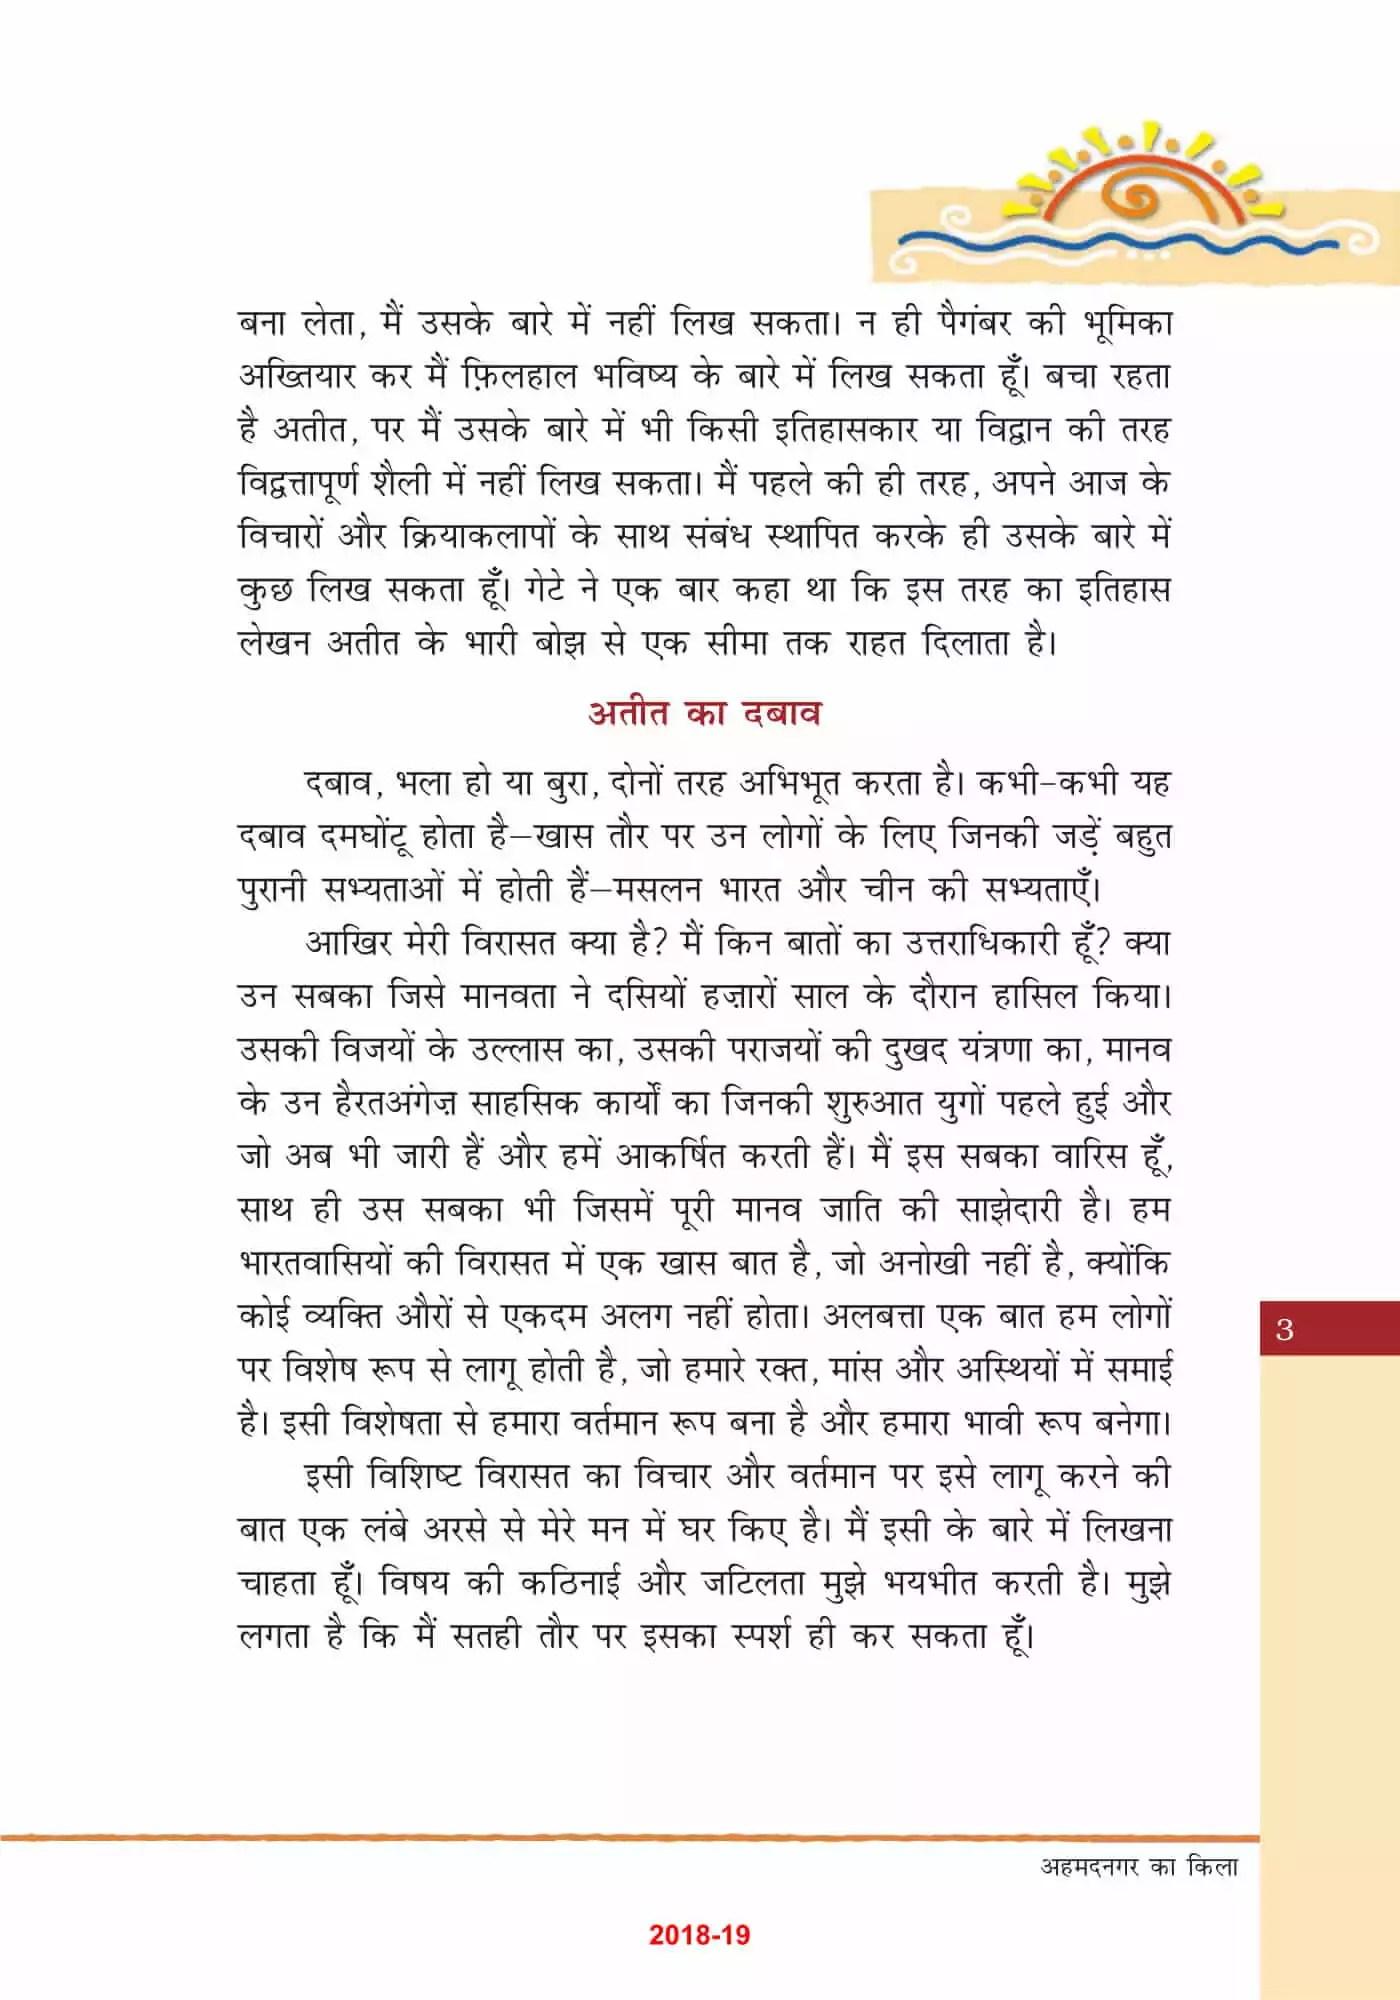 NCERT Solutions For Class 8 Hindi Bharat Ki Khoj Chapter 1